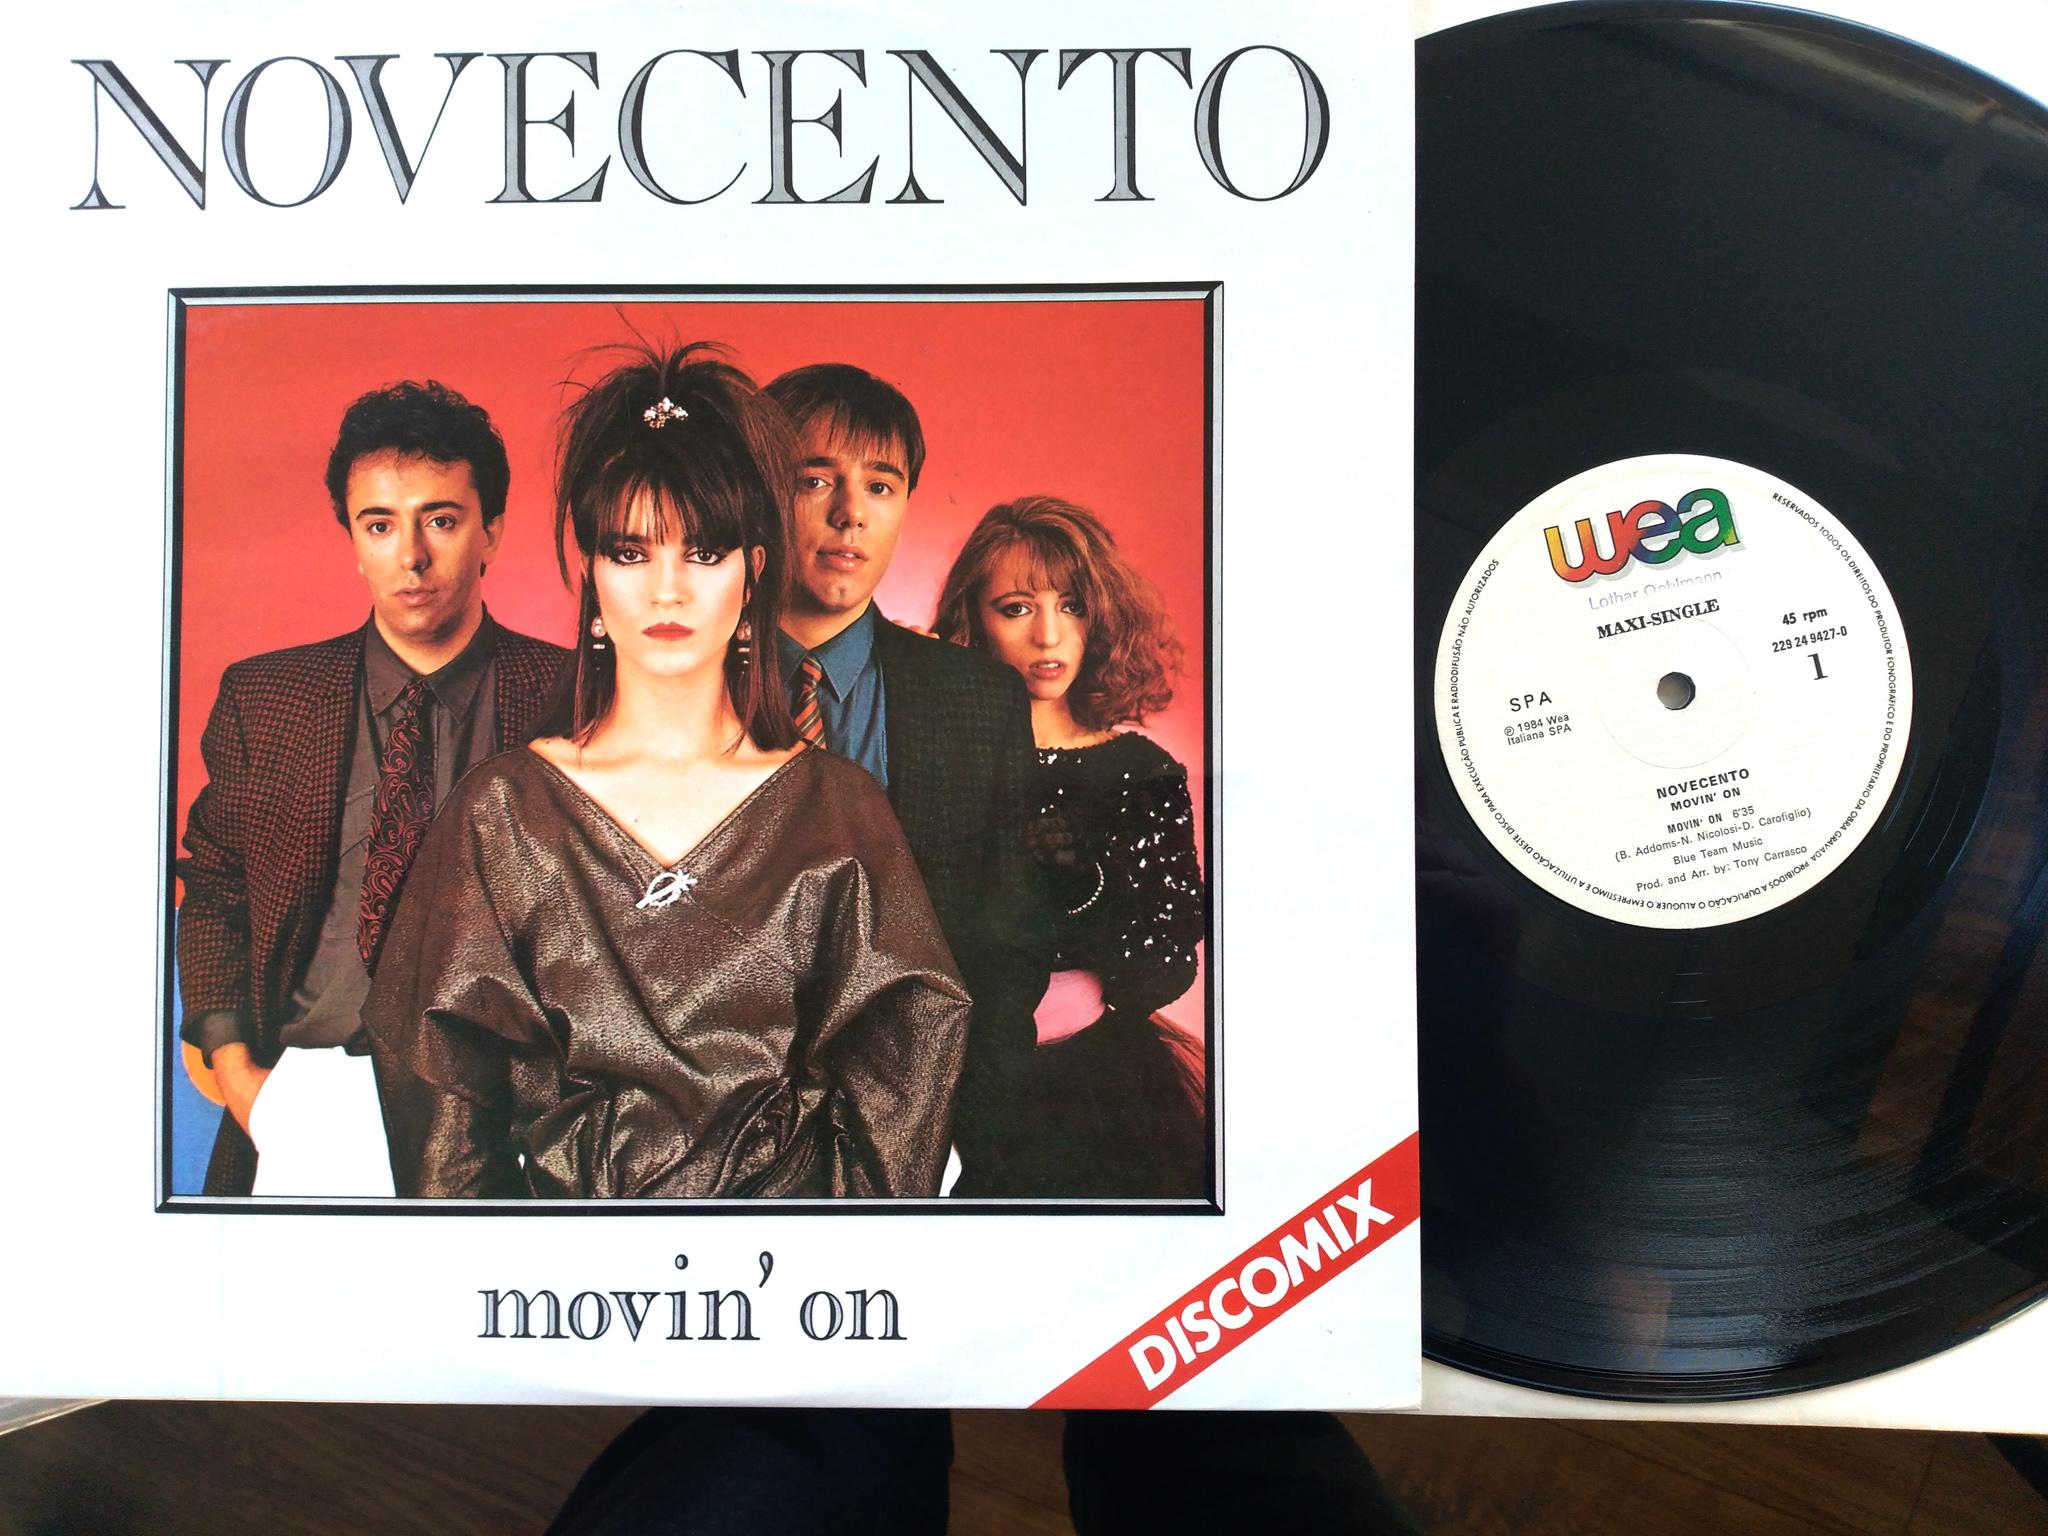 Novecento - Movin' On